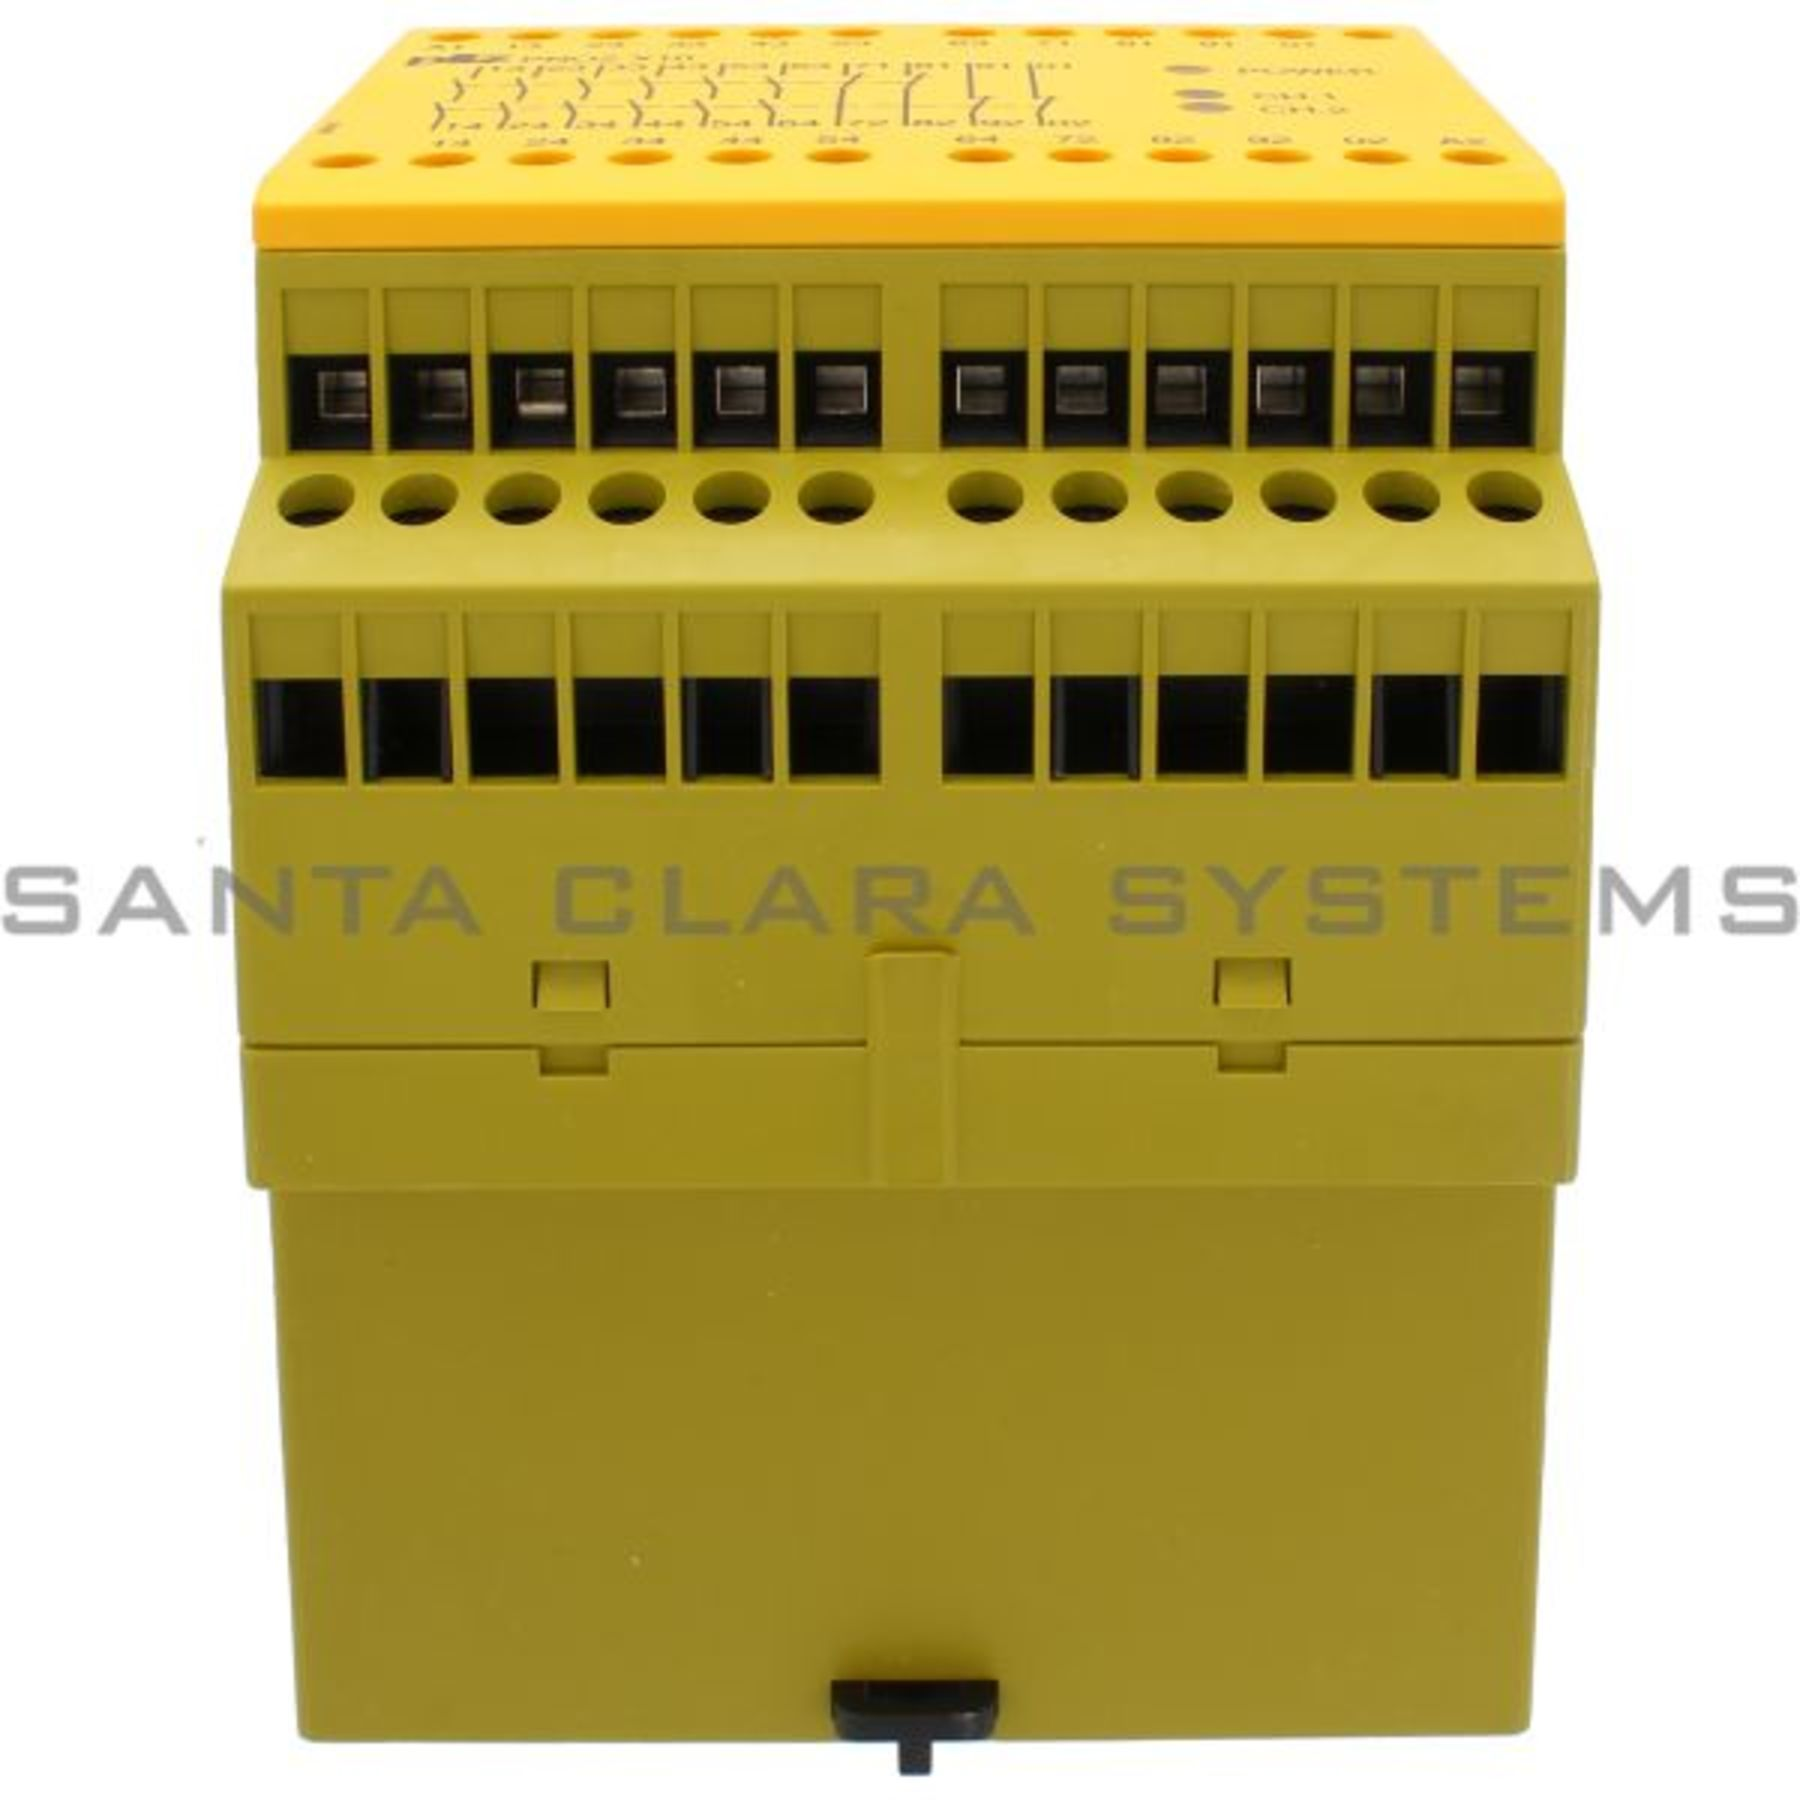 Pnozx1024vdc6n O4n C3led 774709 Safety Relay Standalone Inputs 1 Wiring A 24vdc Pilz Pnoz X10 6n O 4n C 3led